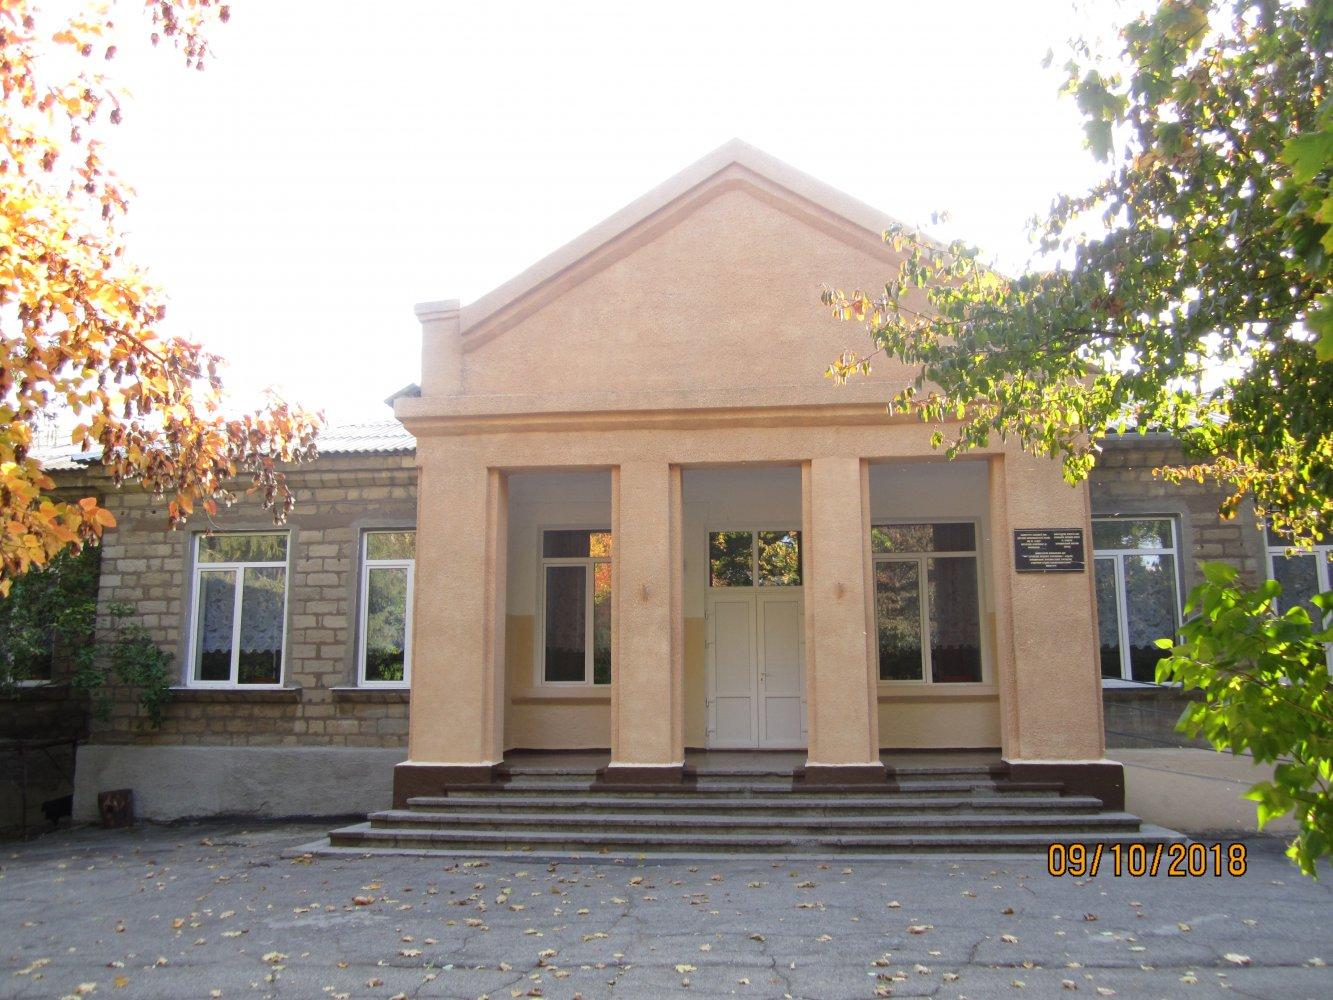 Фото IMG_2954.jpg. Молдова, Бендеры, улица Протягайловская